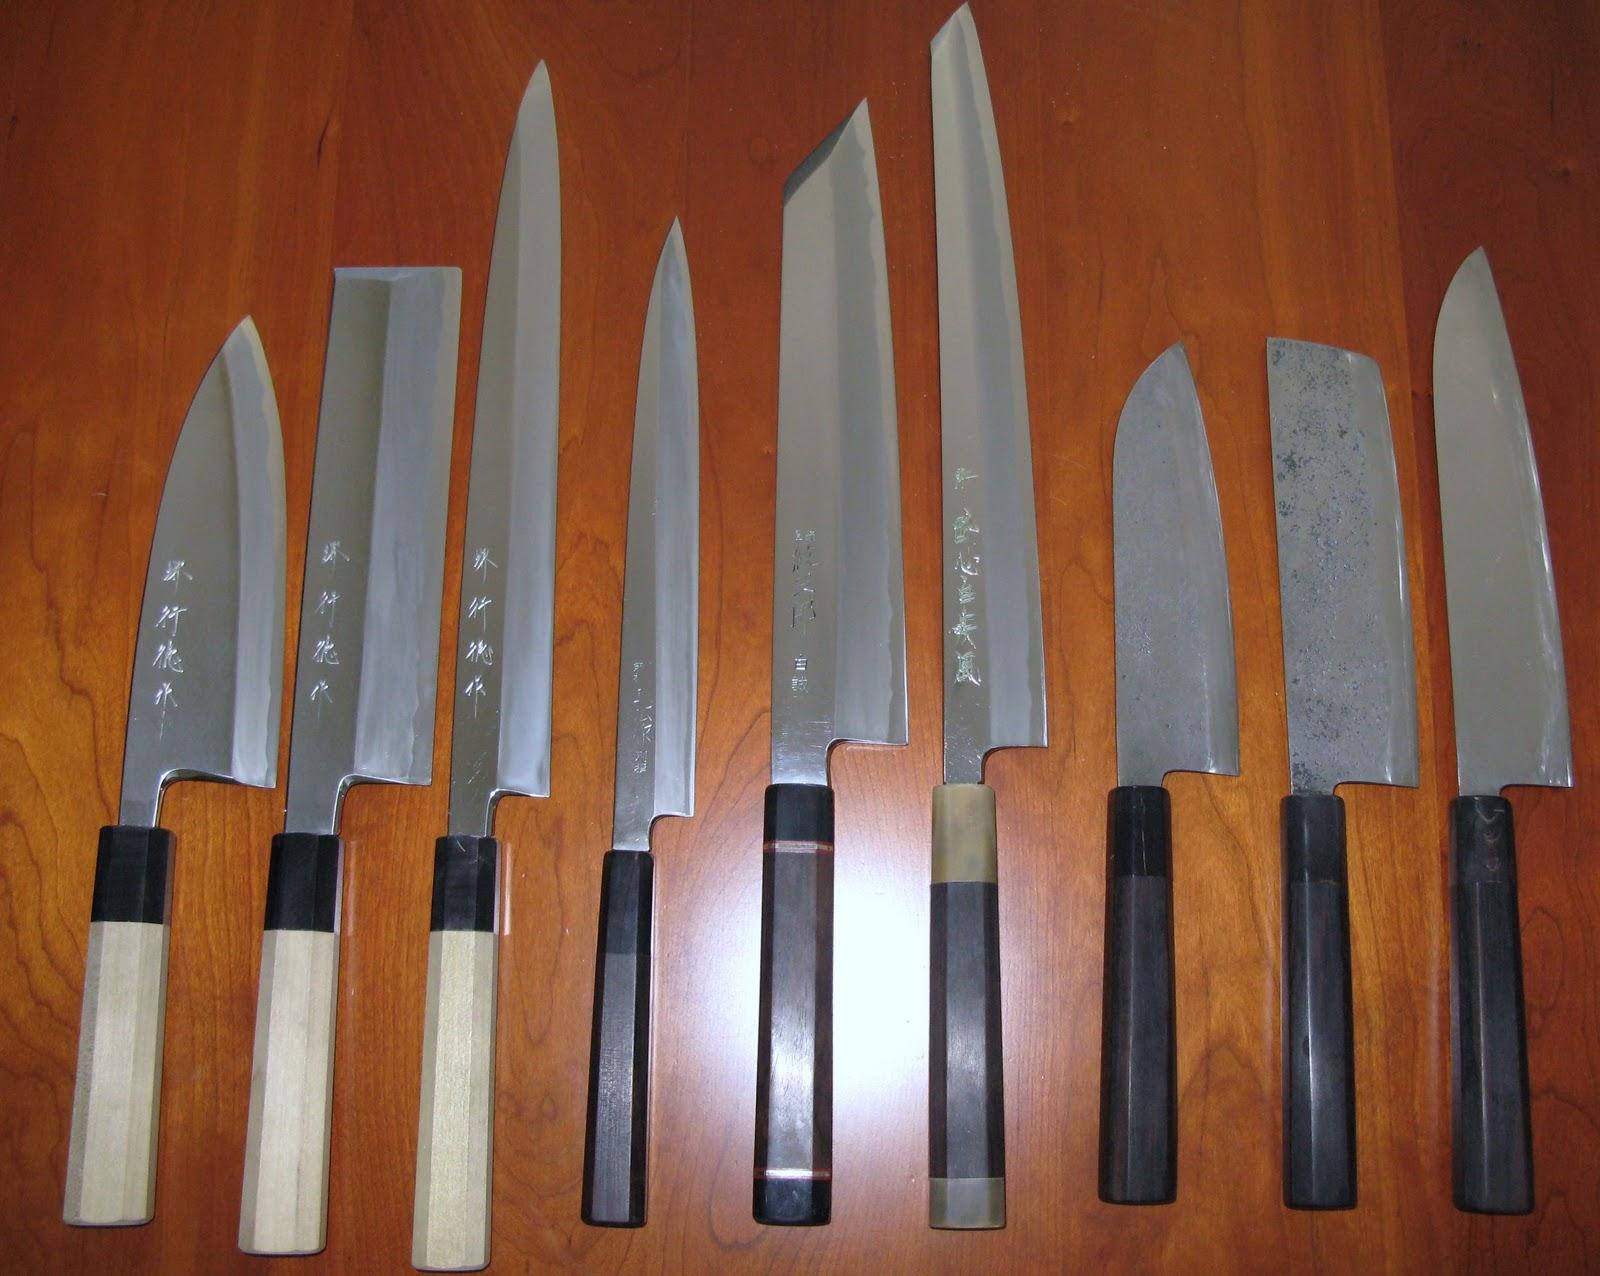 Darkhoeks Creative Culinarium: Knives, Knives, Knives